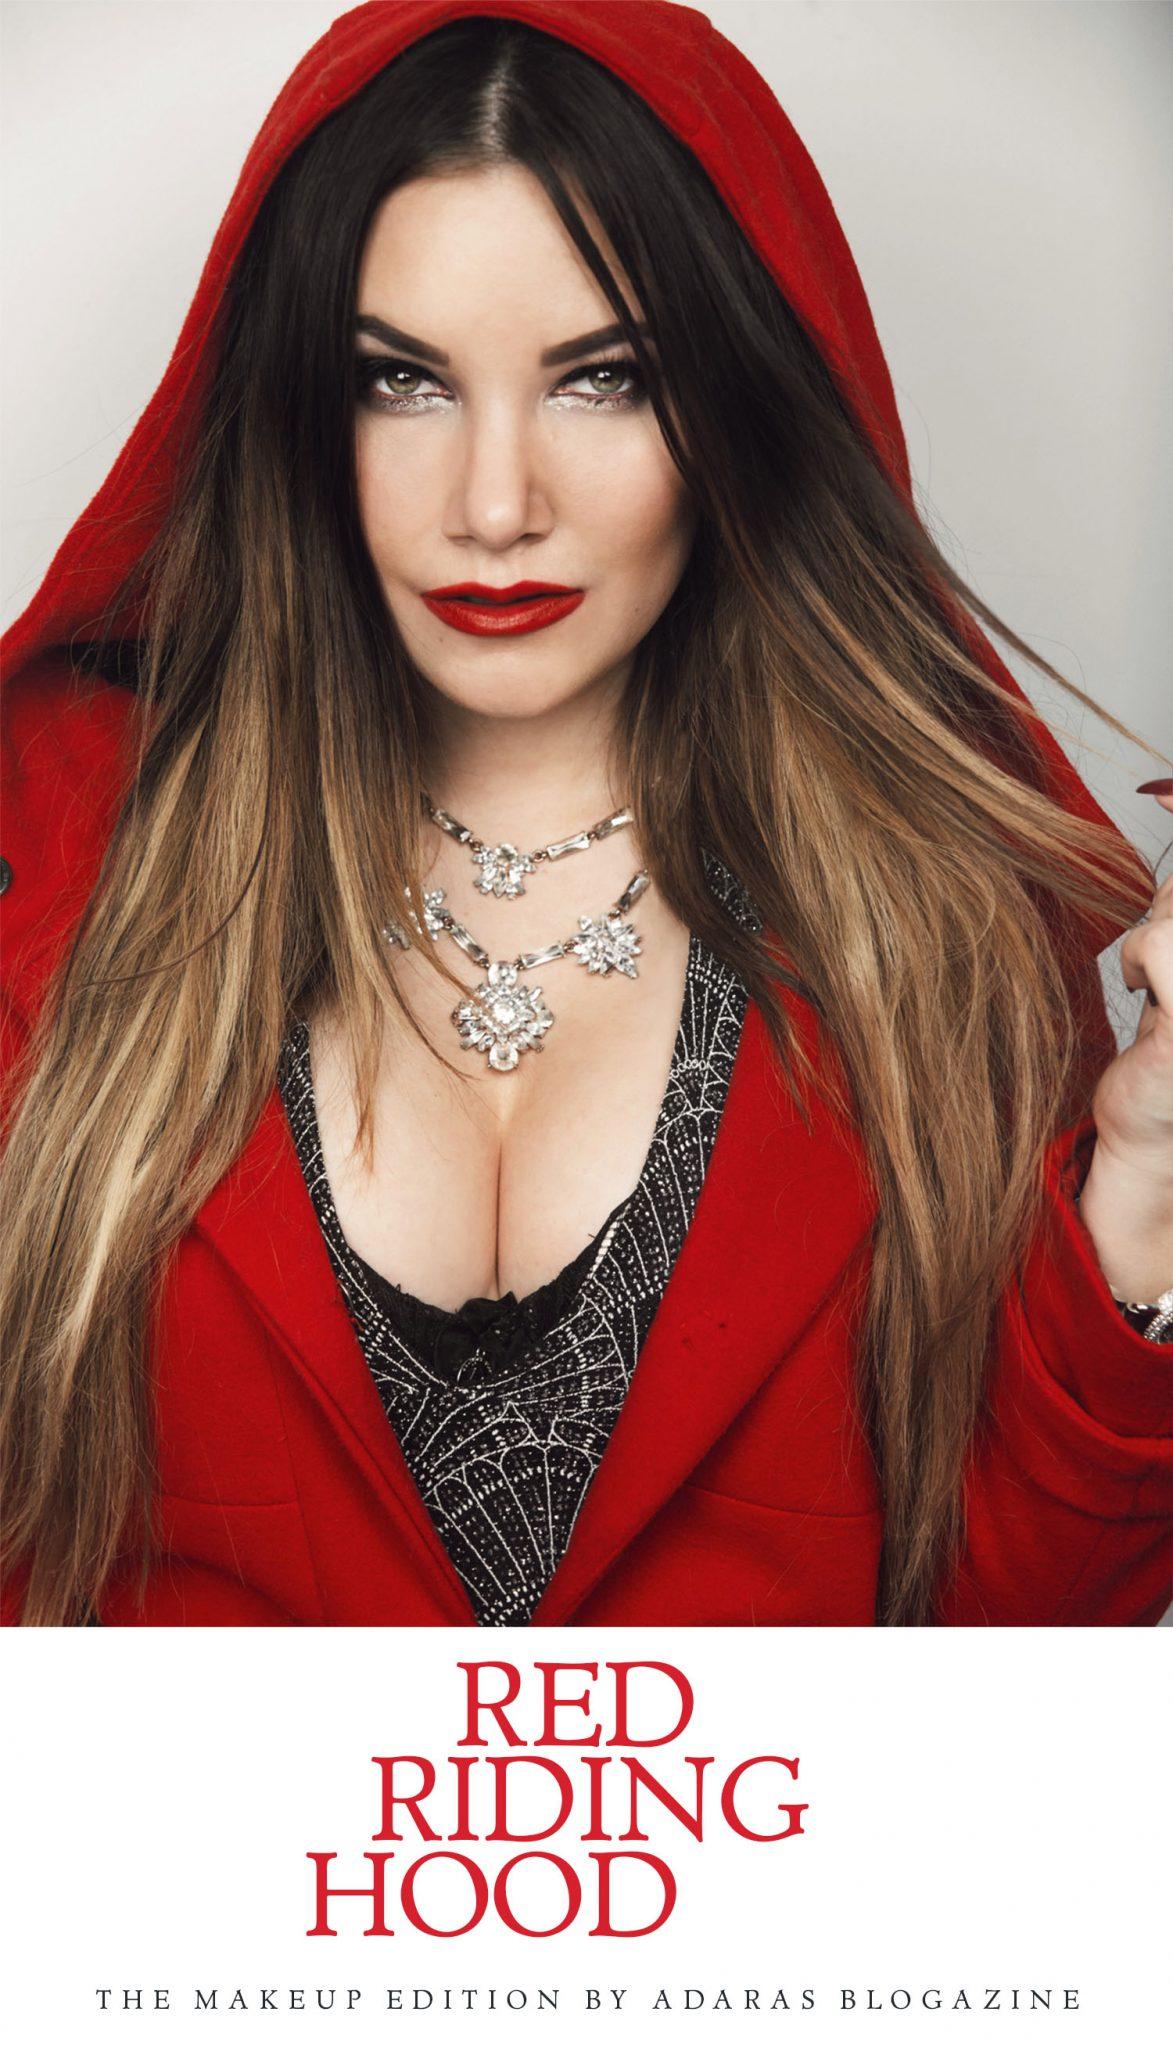 Little Red Riding Hood Makeup & Glamour Outfiit - Sminka dig som Rödluvan